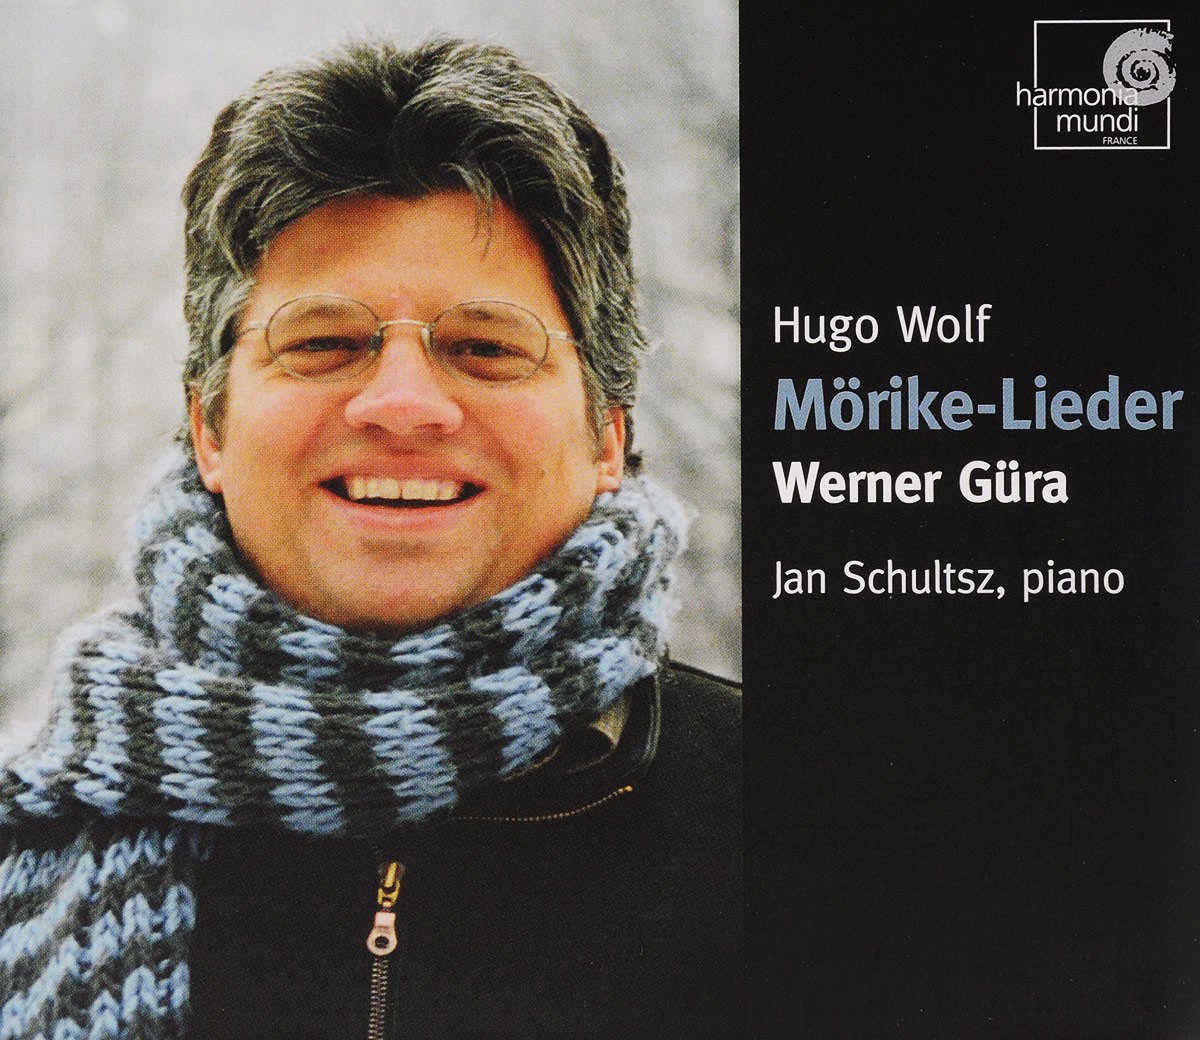 Исполнитель: VARIOUSАльбом: WOLF, H./LIEDERS ON POEMS BY MORIKE/WERNER GURA, TENOR/IAN SCHULTSZ, PIANOПроизводитель: HARMONIA MUNDI